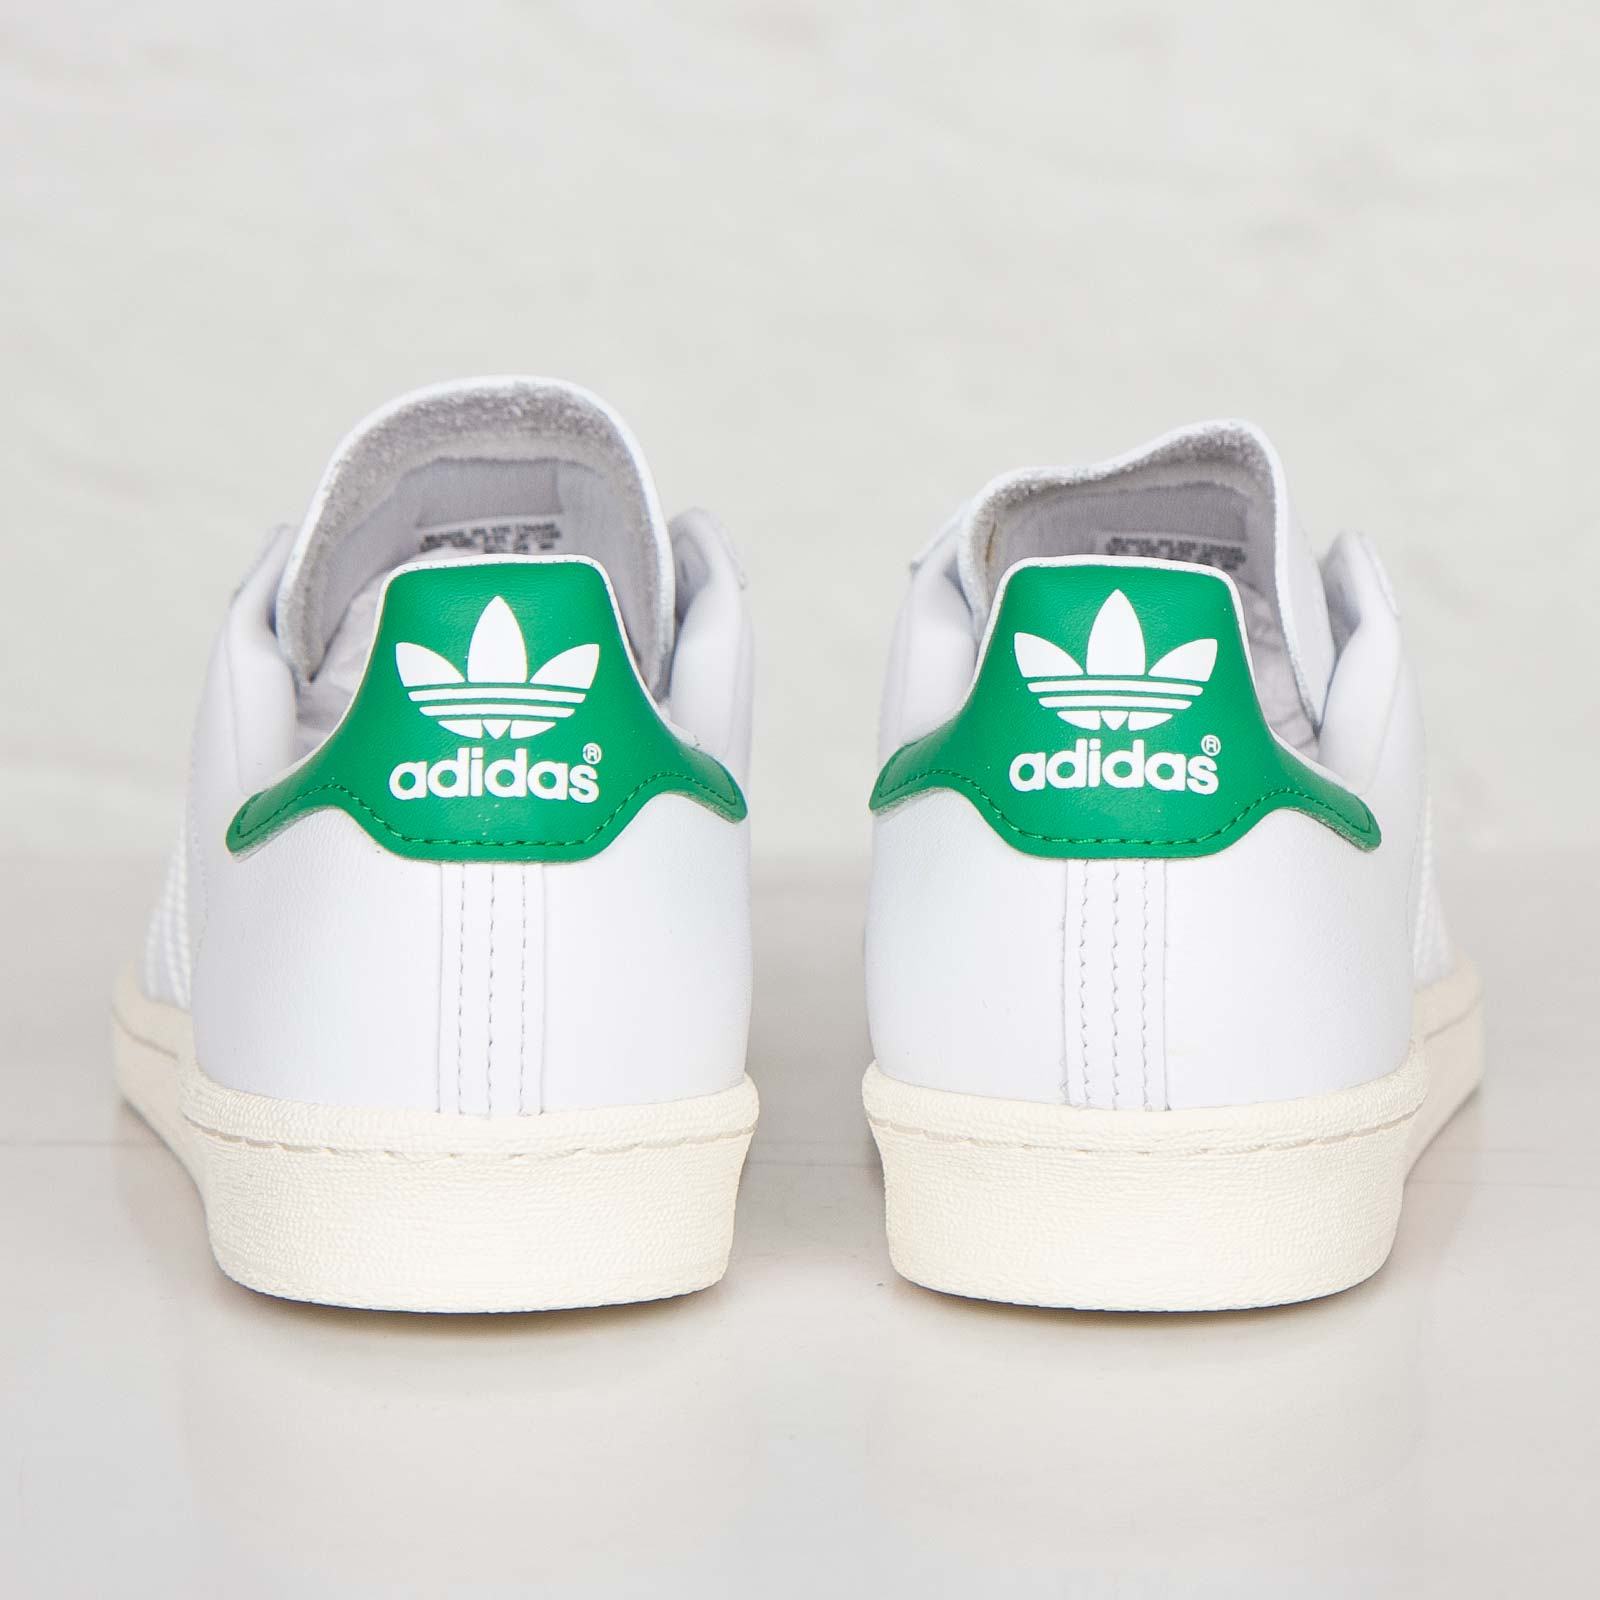 2bcac6332cc7 adidas Campus 80s Nigo - B33821 - Sneakersnstuff